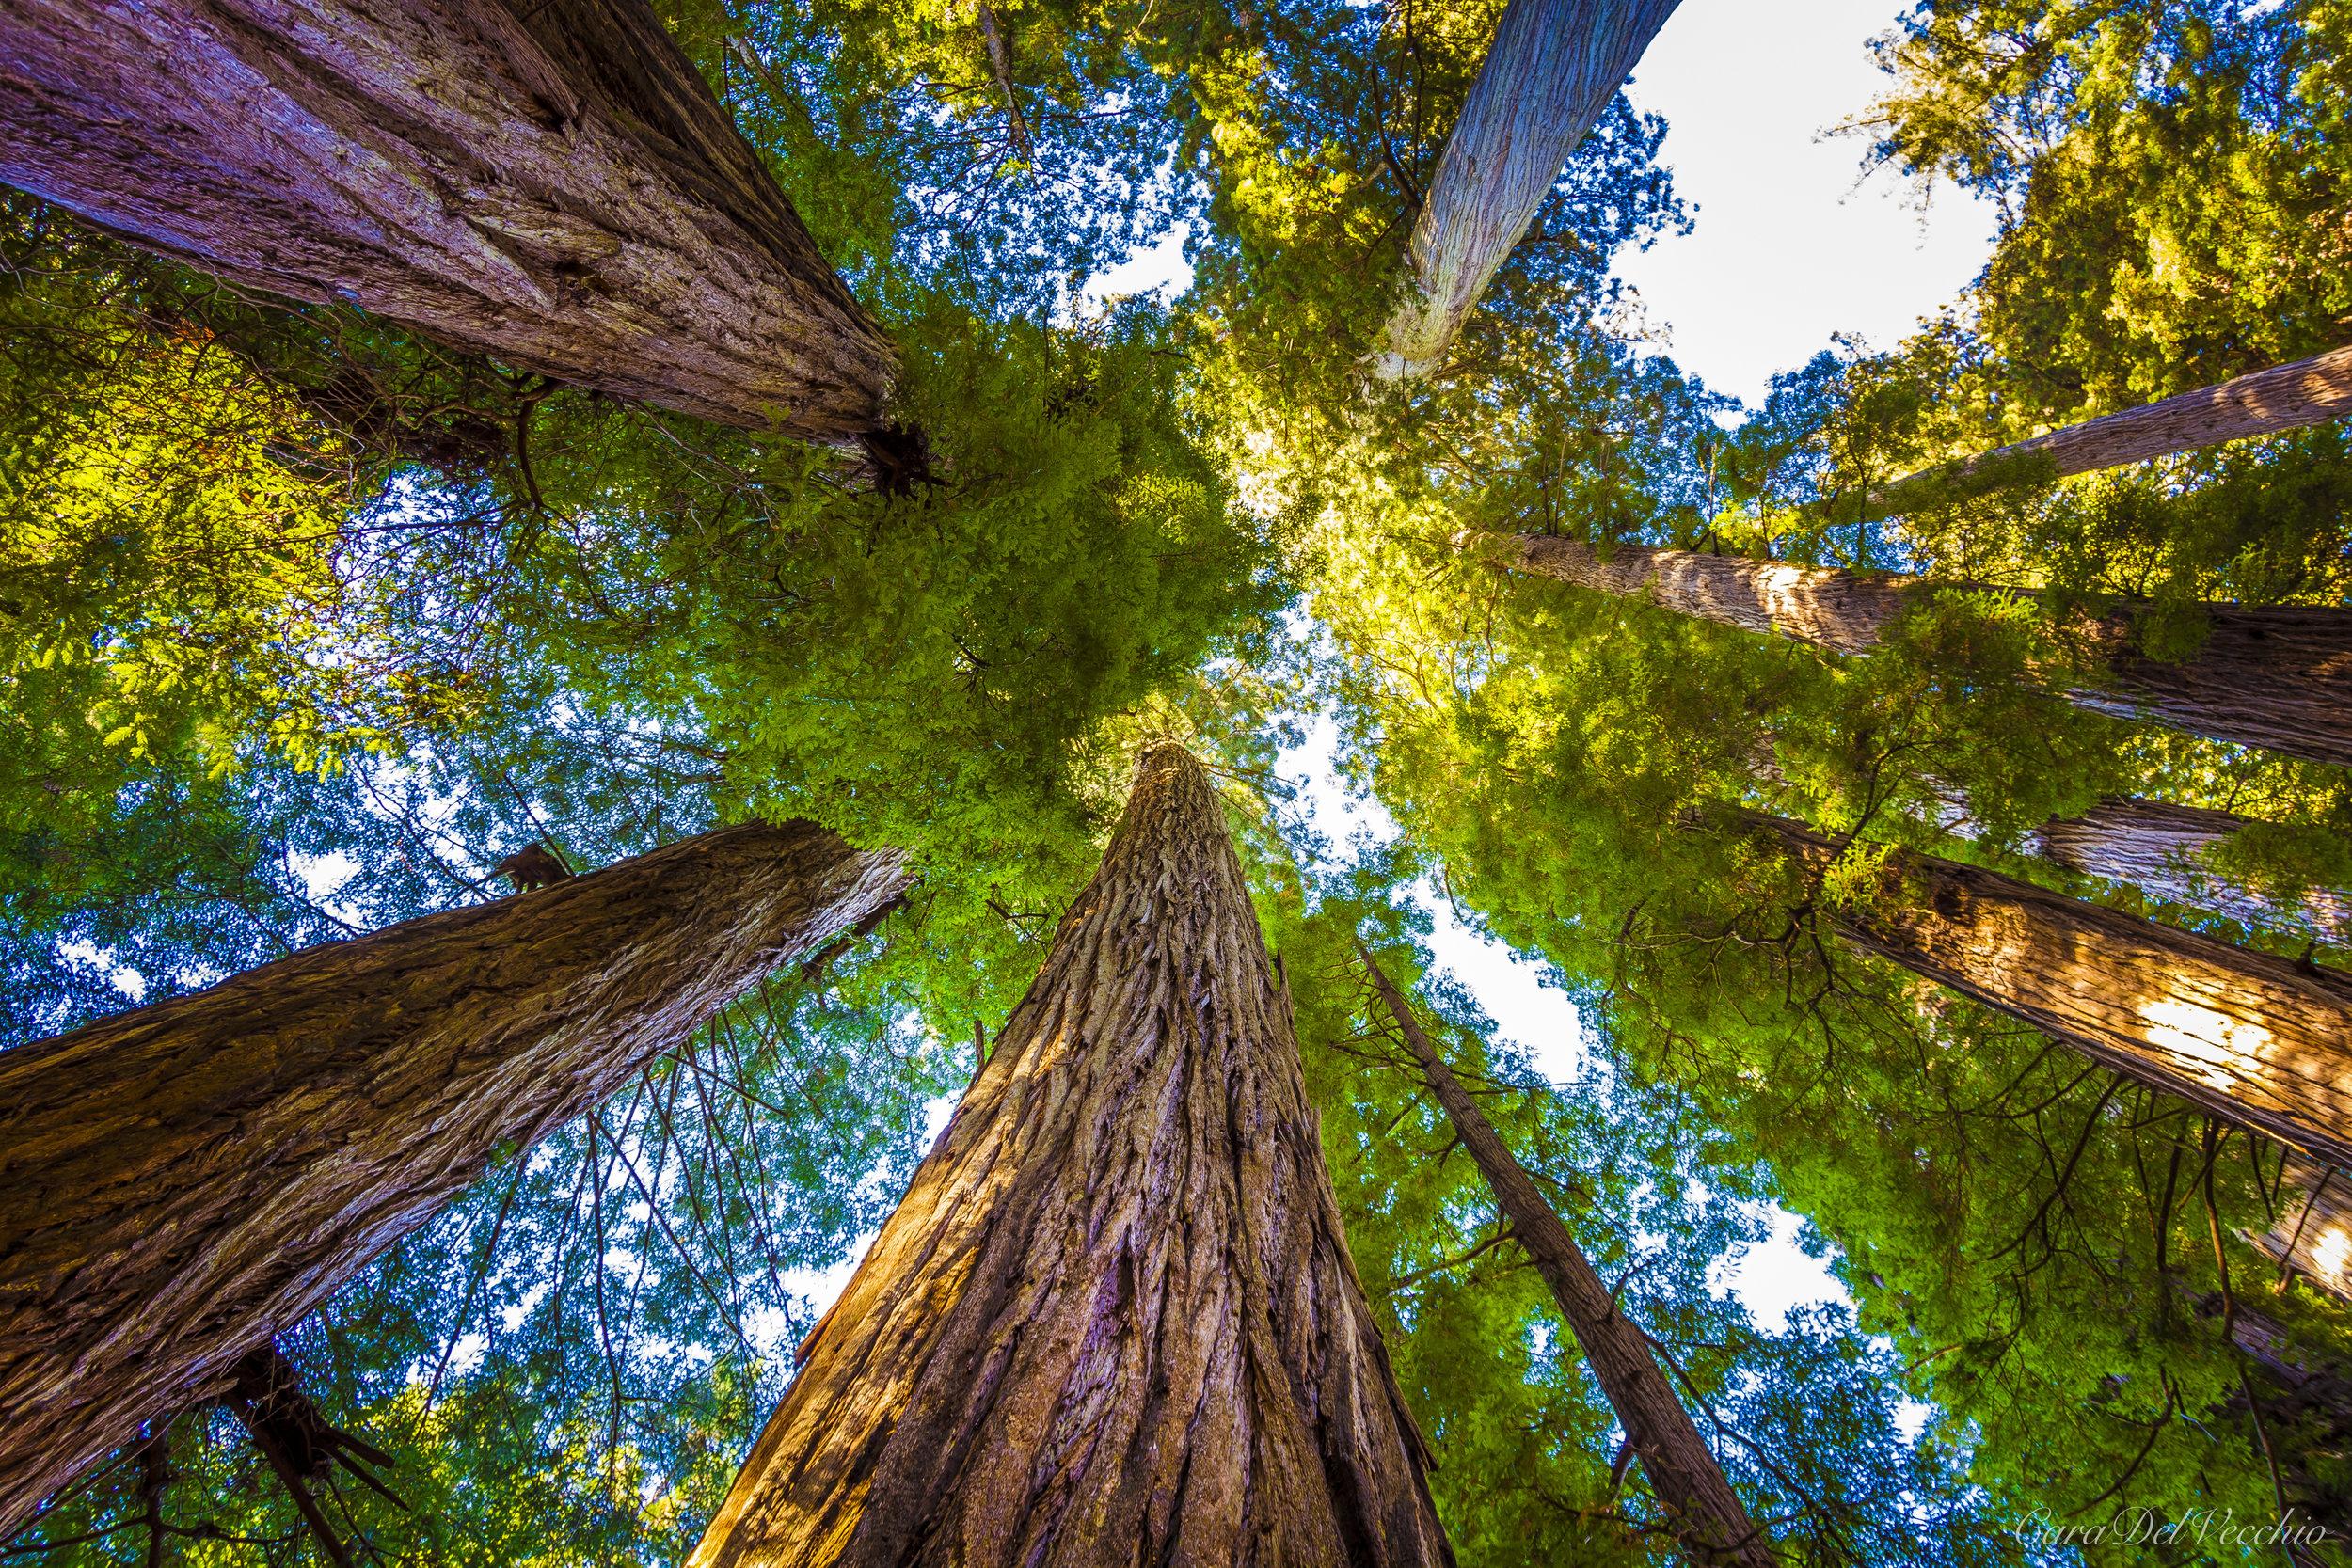 IMAGE #3 (Redwoods)